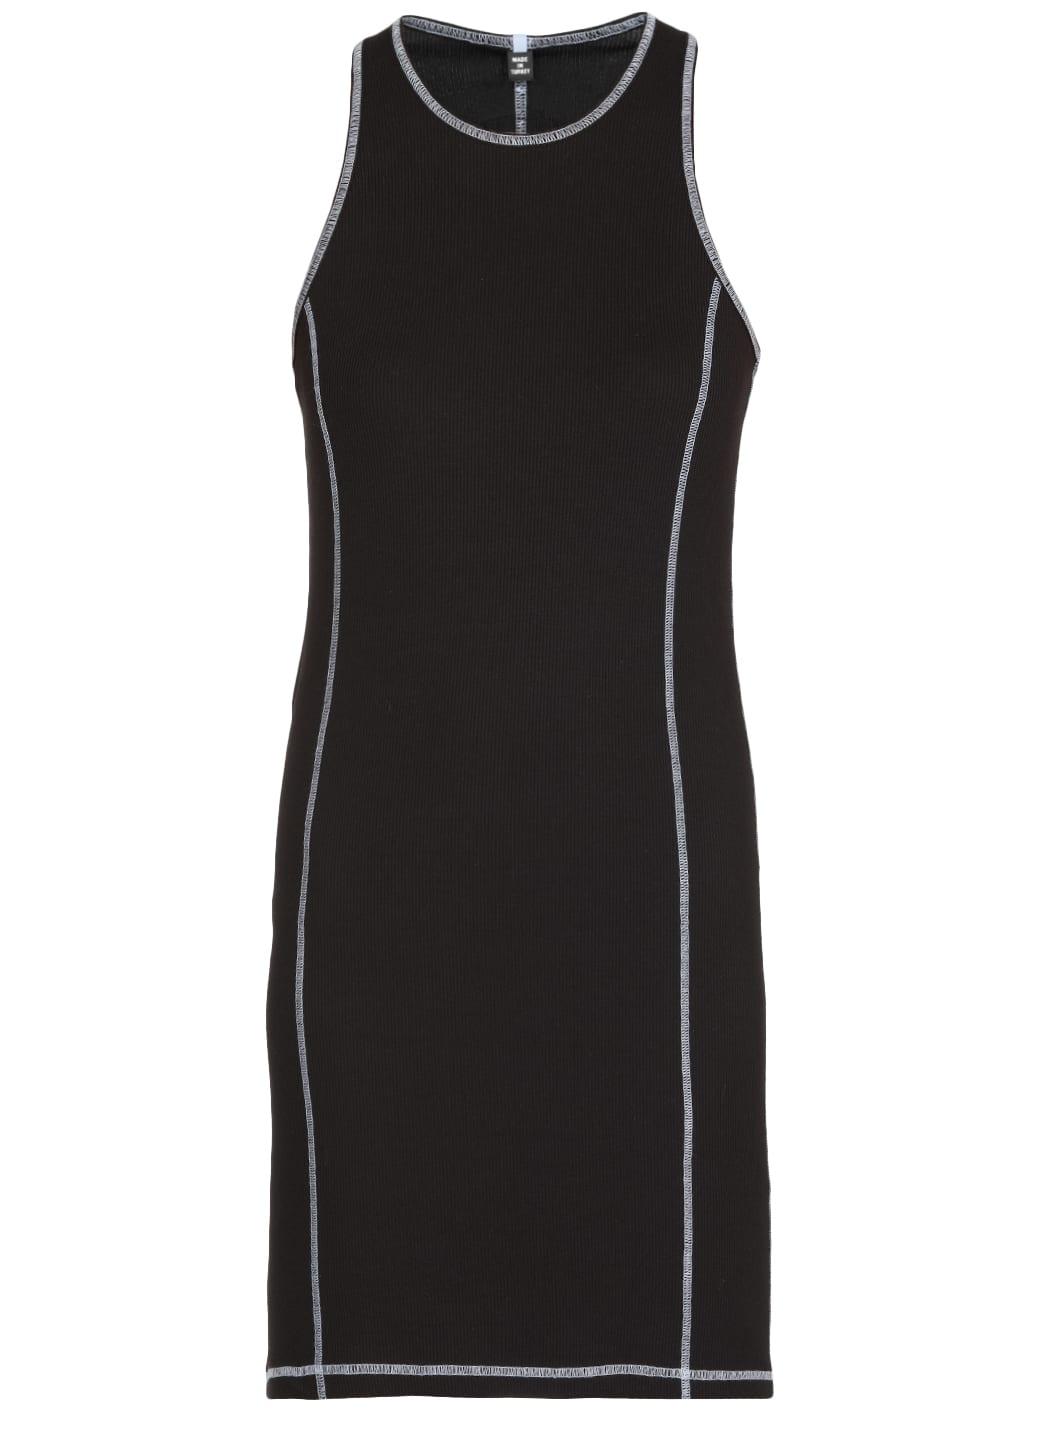 Buy McQ Alexander McQueen Icon Zero: Mini Tank Dress online, shop McQ Alexander McQueen with free shipping